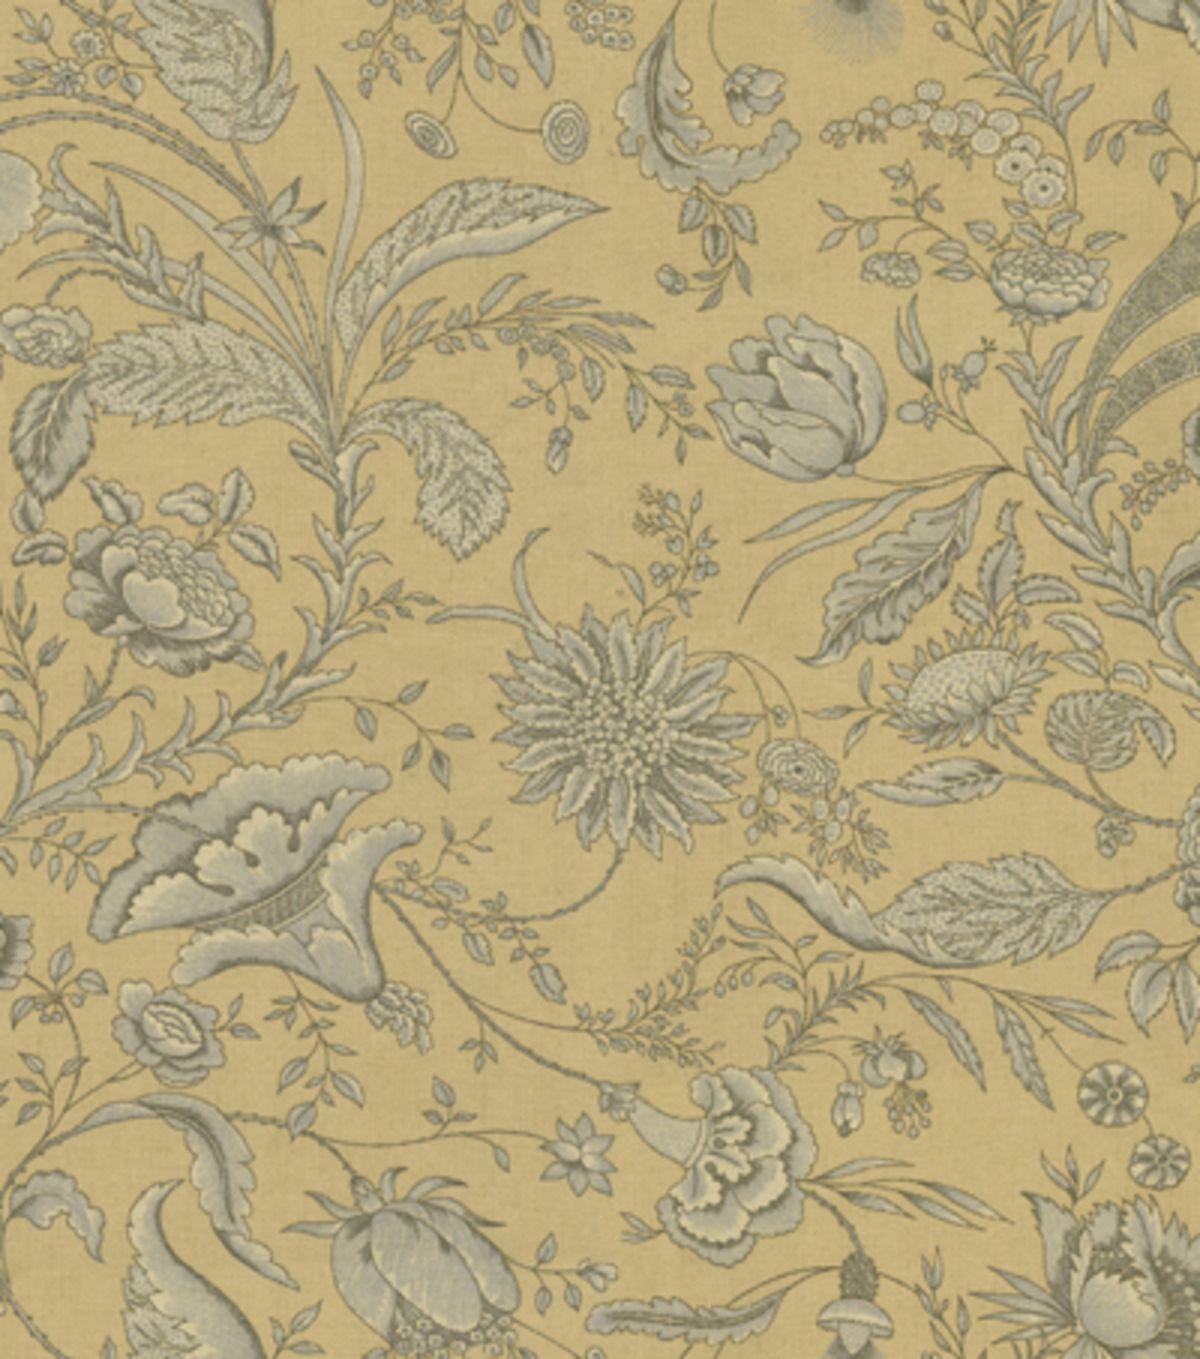 Home Decor Print Fabric-Waverly Fanciful IronstoneHome Decor Print Fabric-Waverly Fanciful Ironstone,